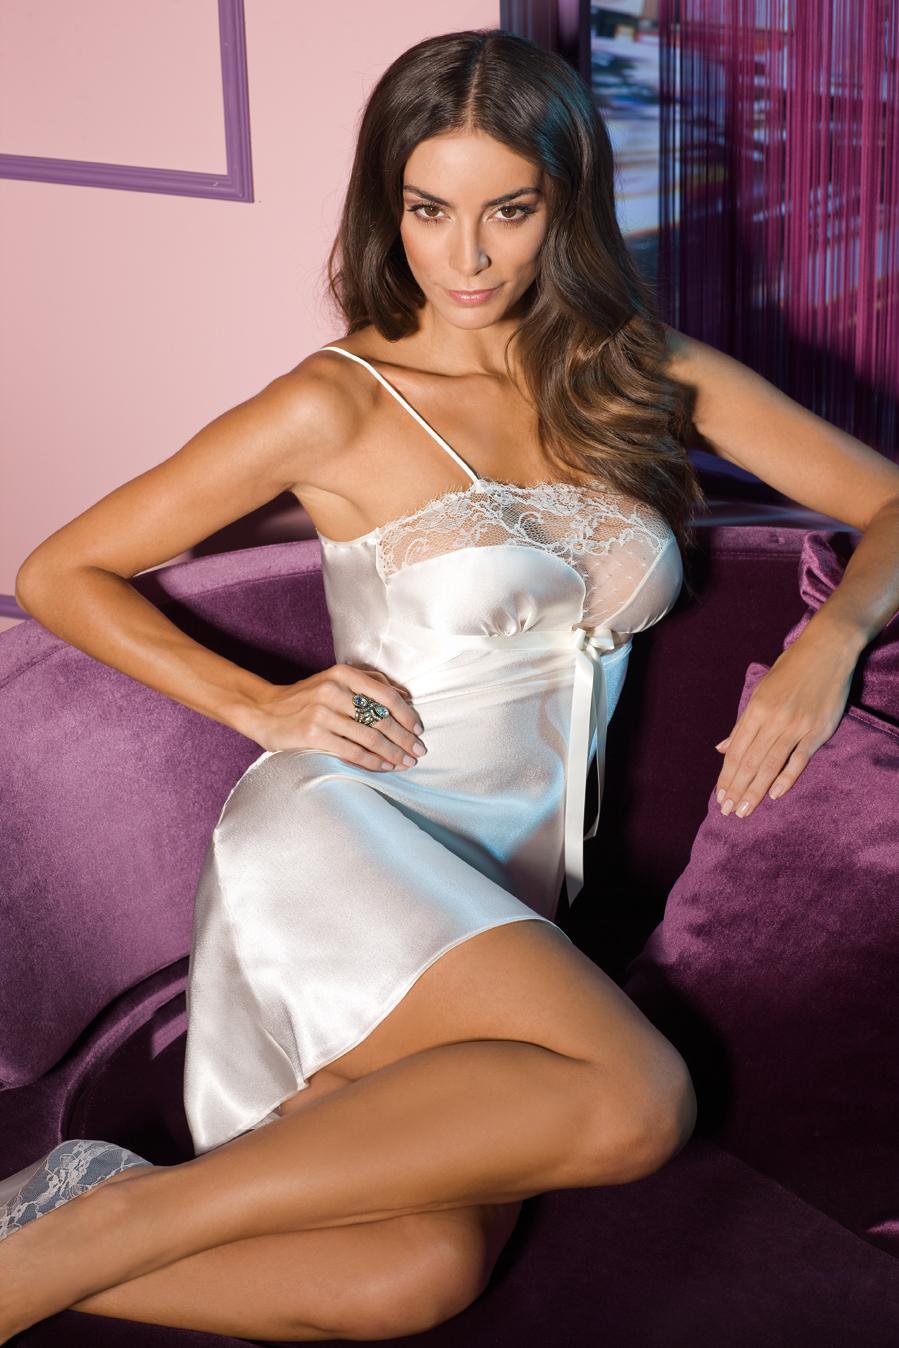 Buy jcss sexy sling sleepwear, women's satin lingerie chemise nightgown loungewear soft nightie dress black